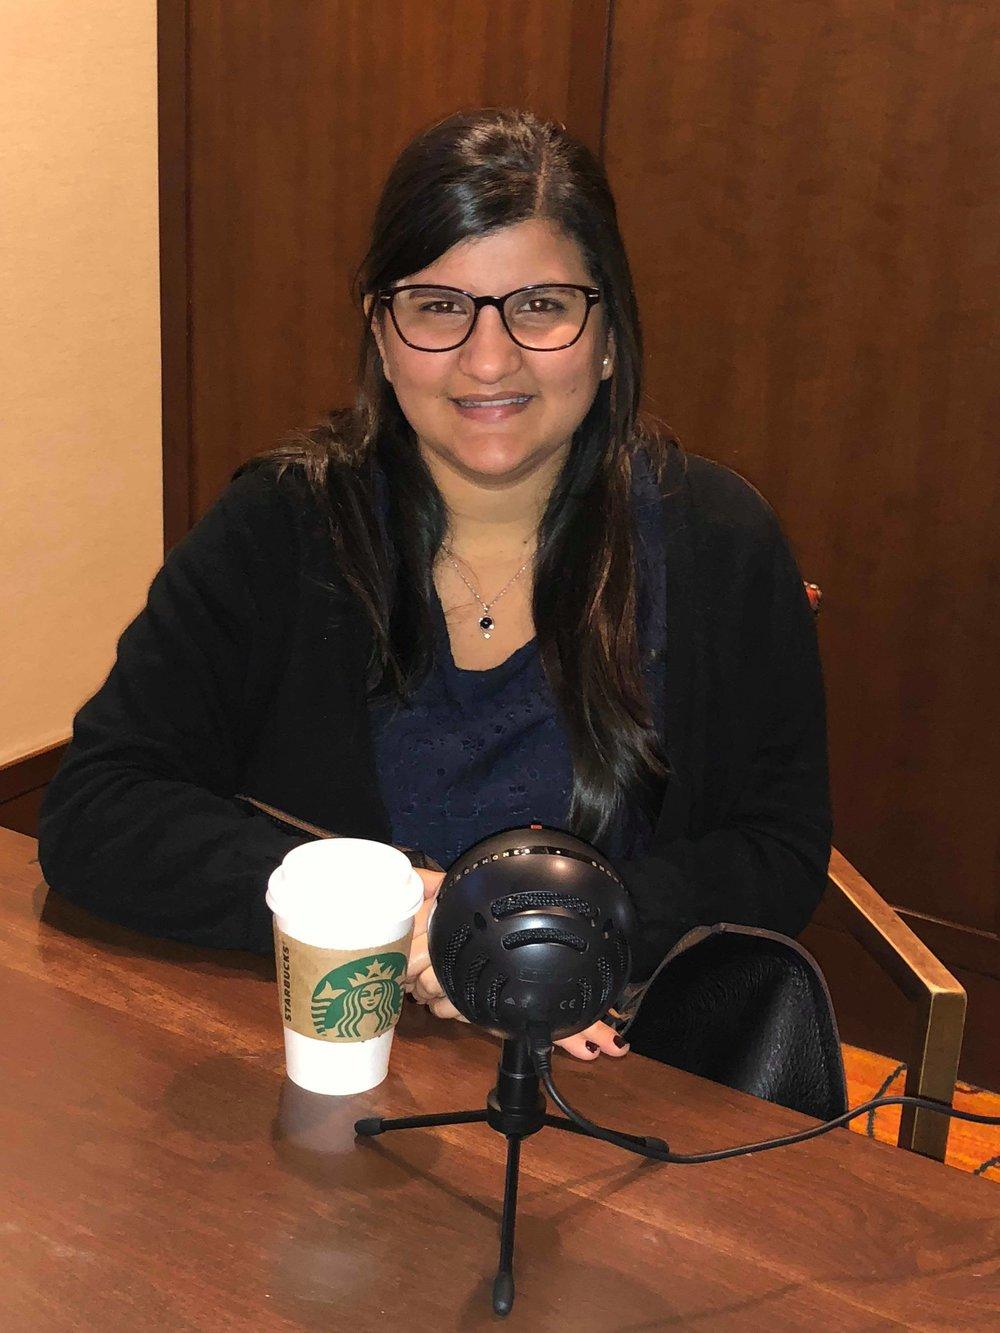 Valeria Reyes-Ruiz